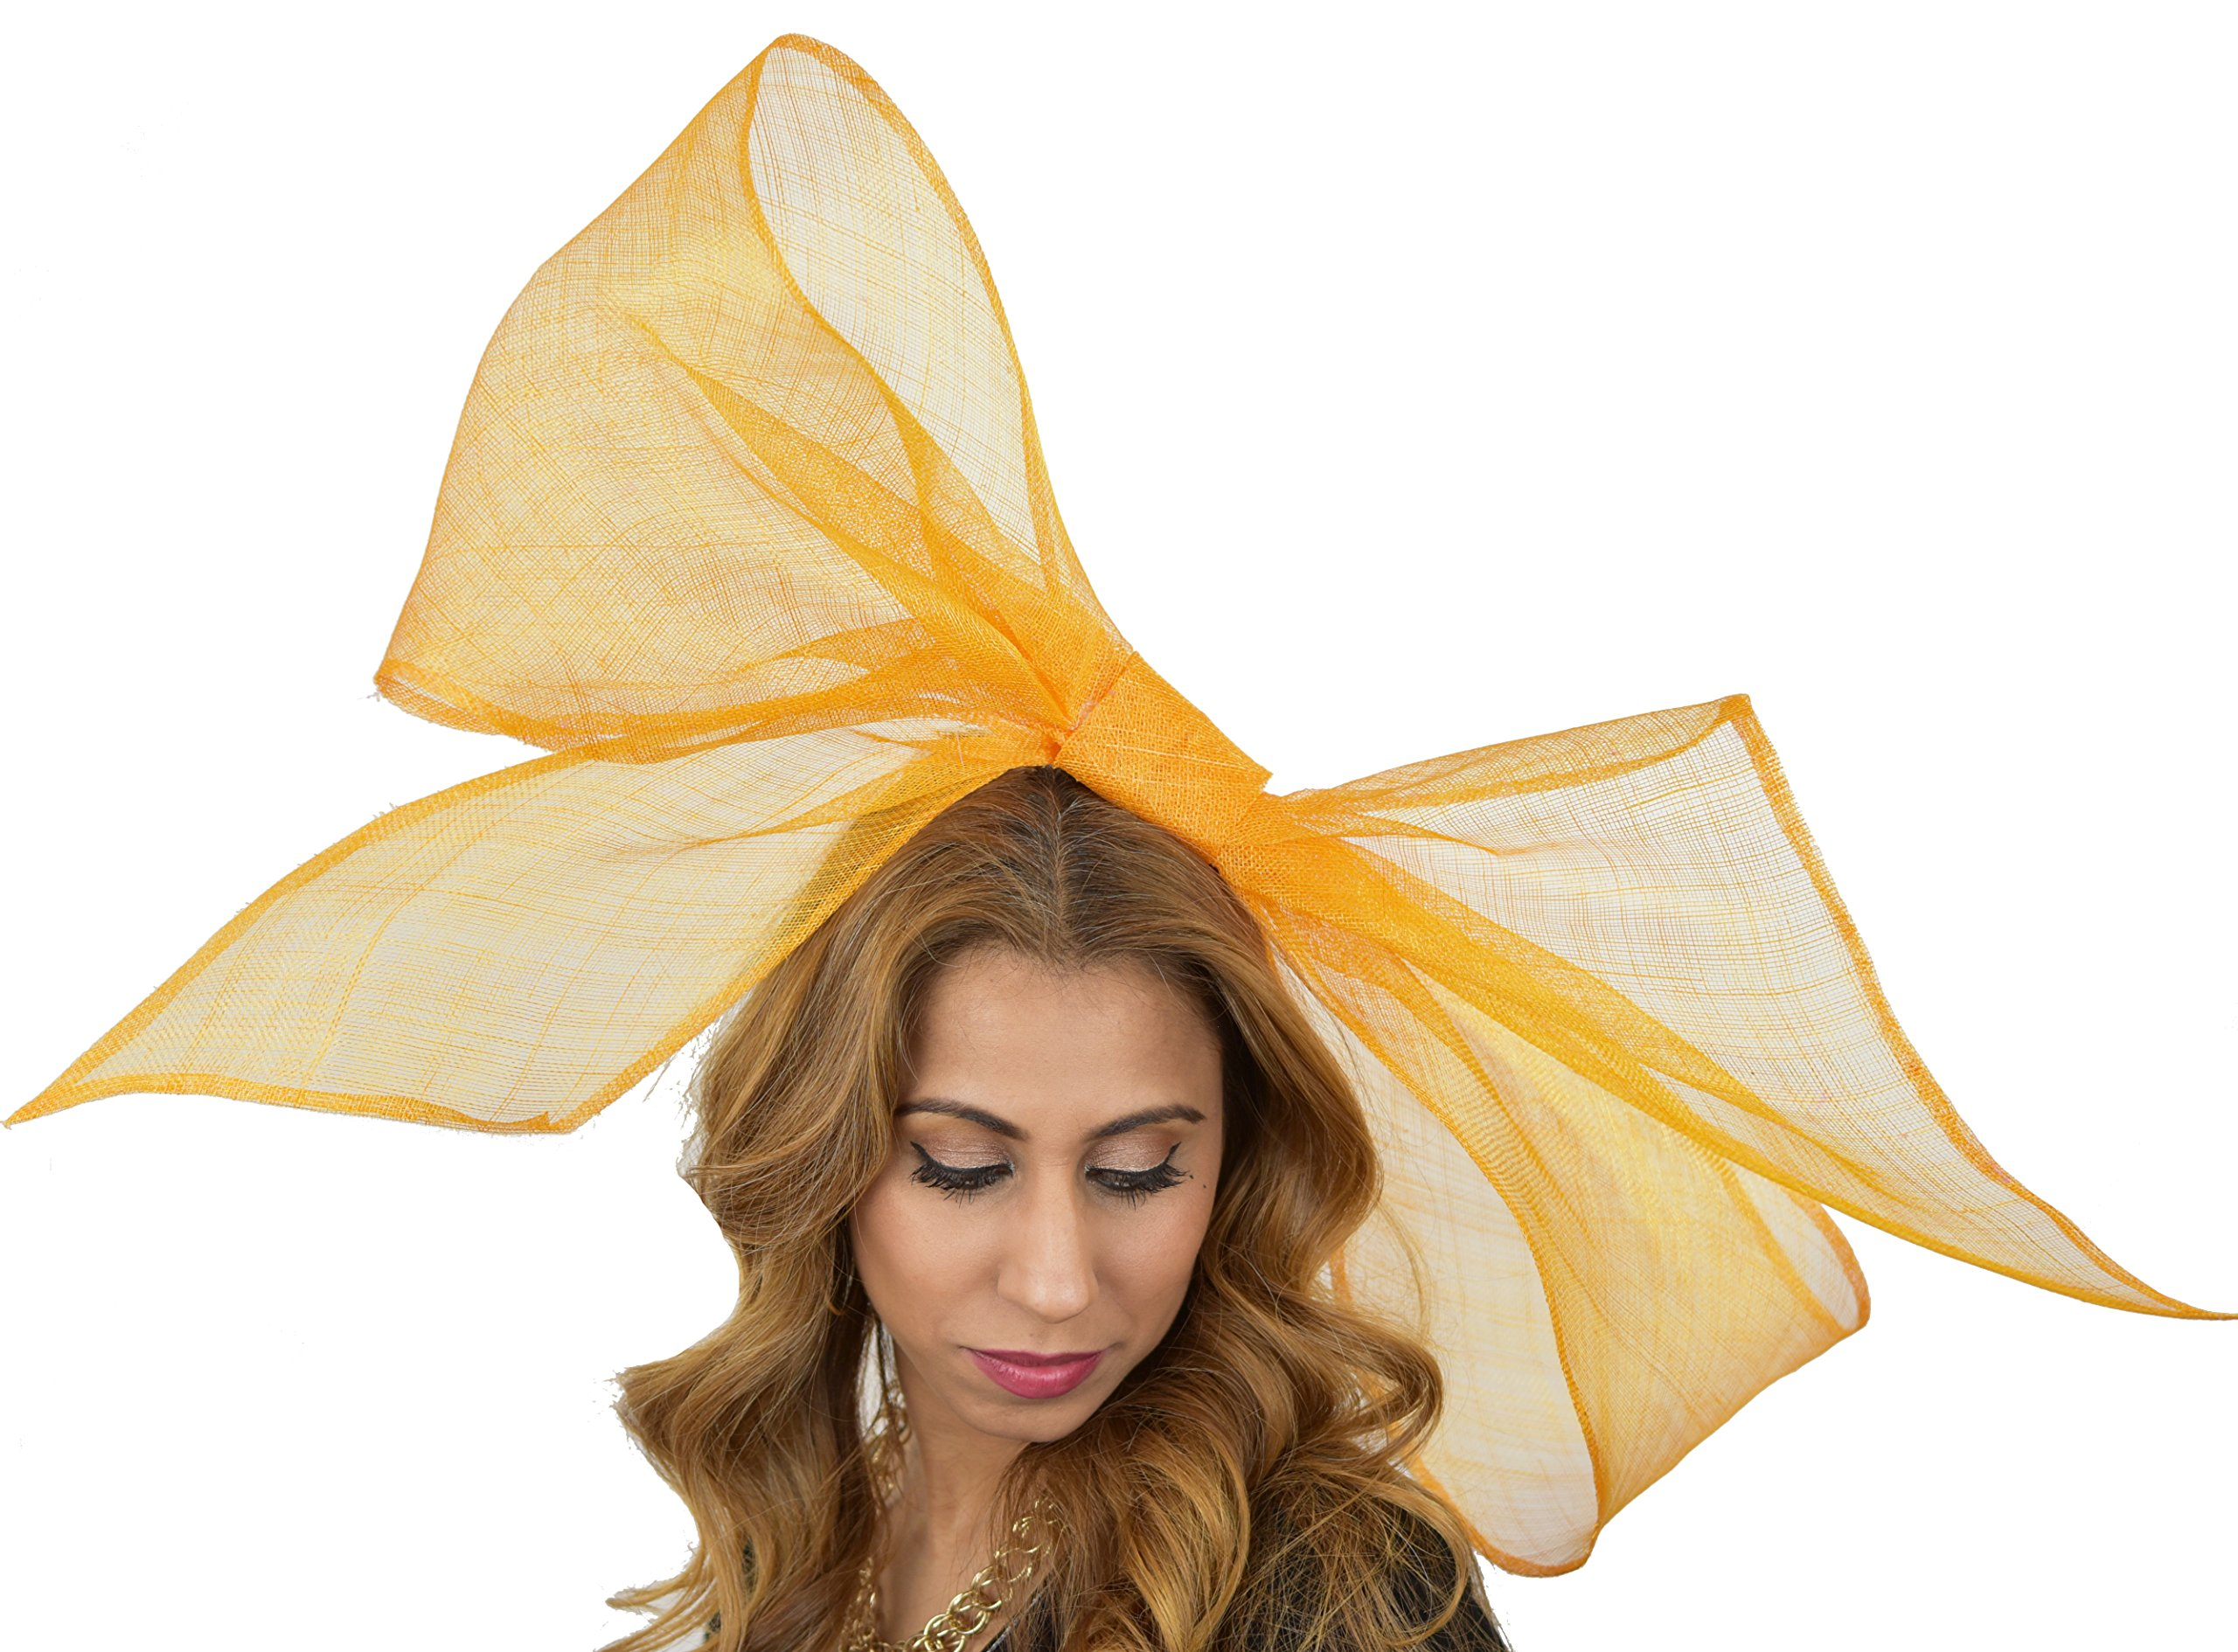 Hats By Cressida Ladies Large Wedding Races Ascot Derby Fascinator Headband Orange